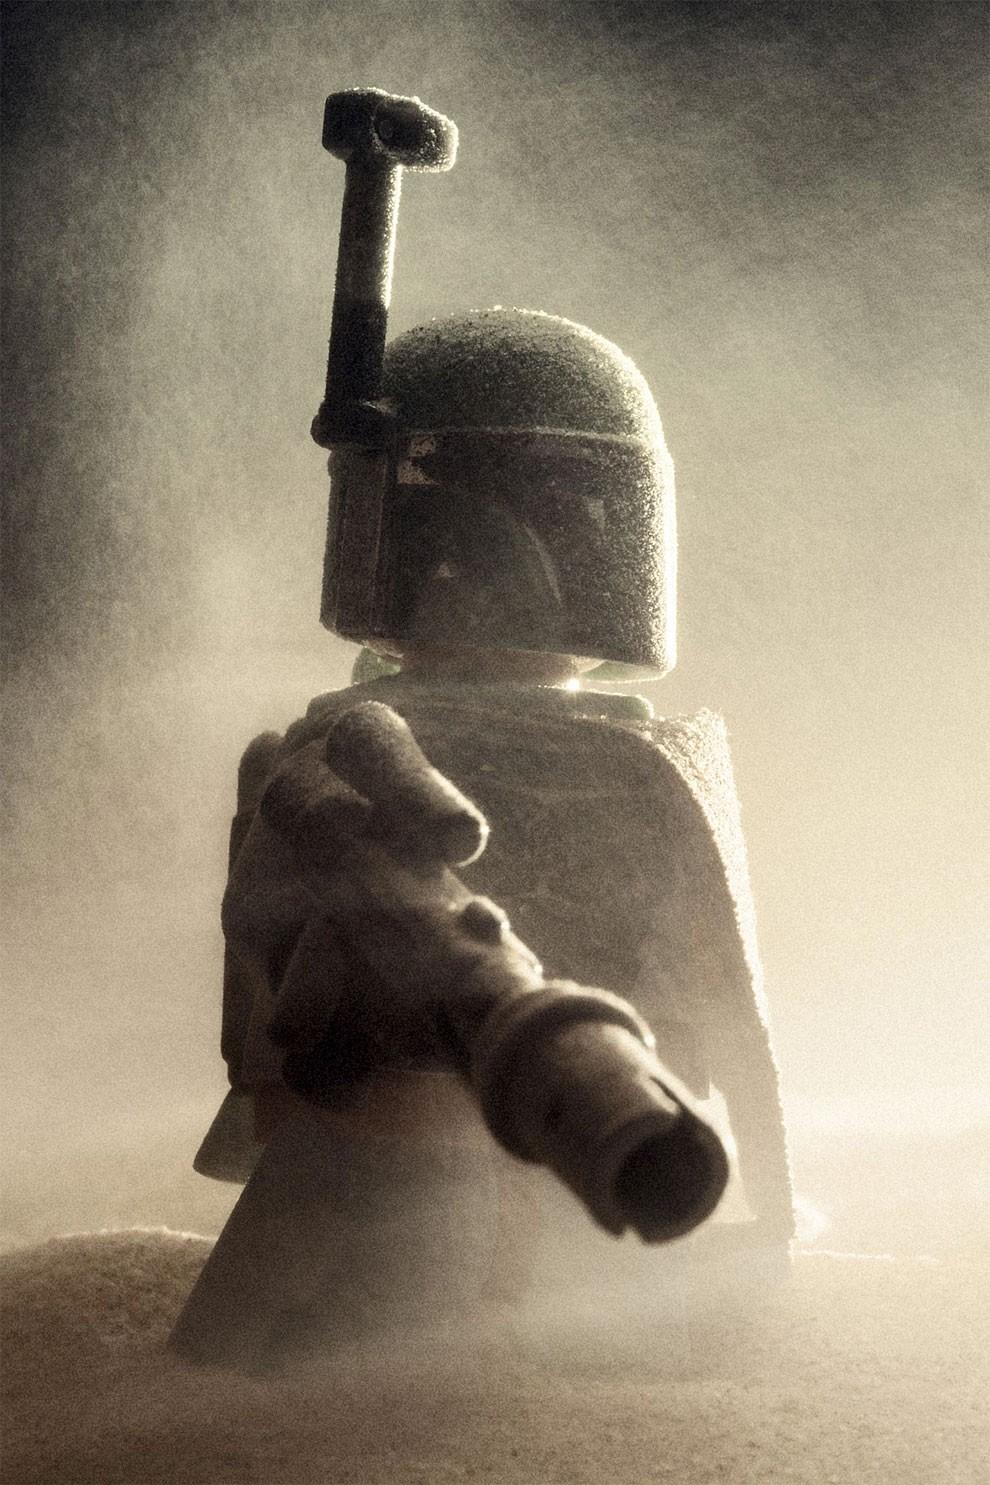 scene-miniatura-star-wars-lego-guerre-stellari-vesa-lehtimaki-11